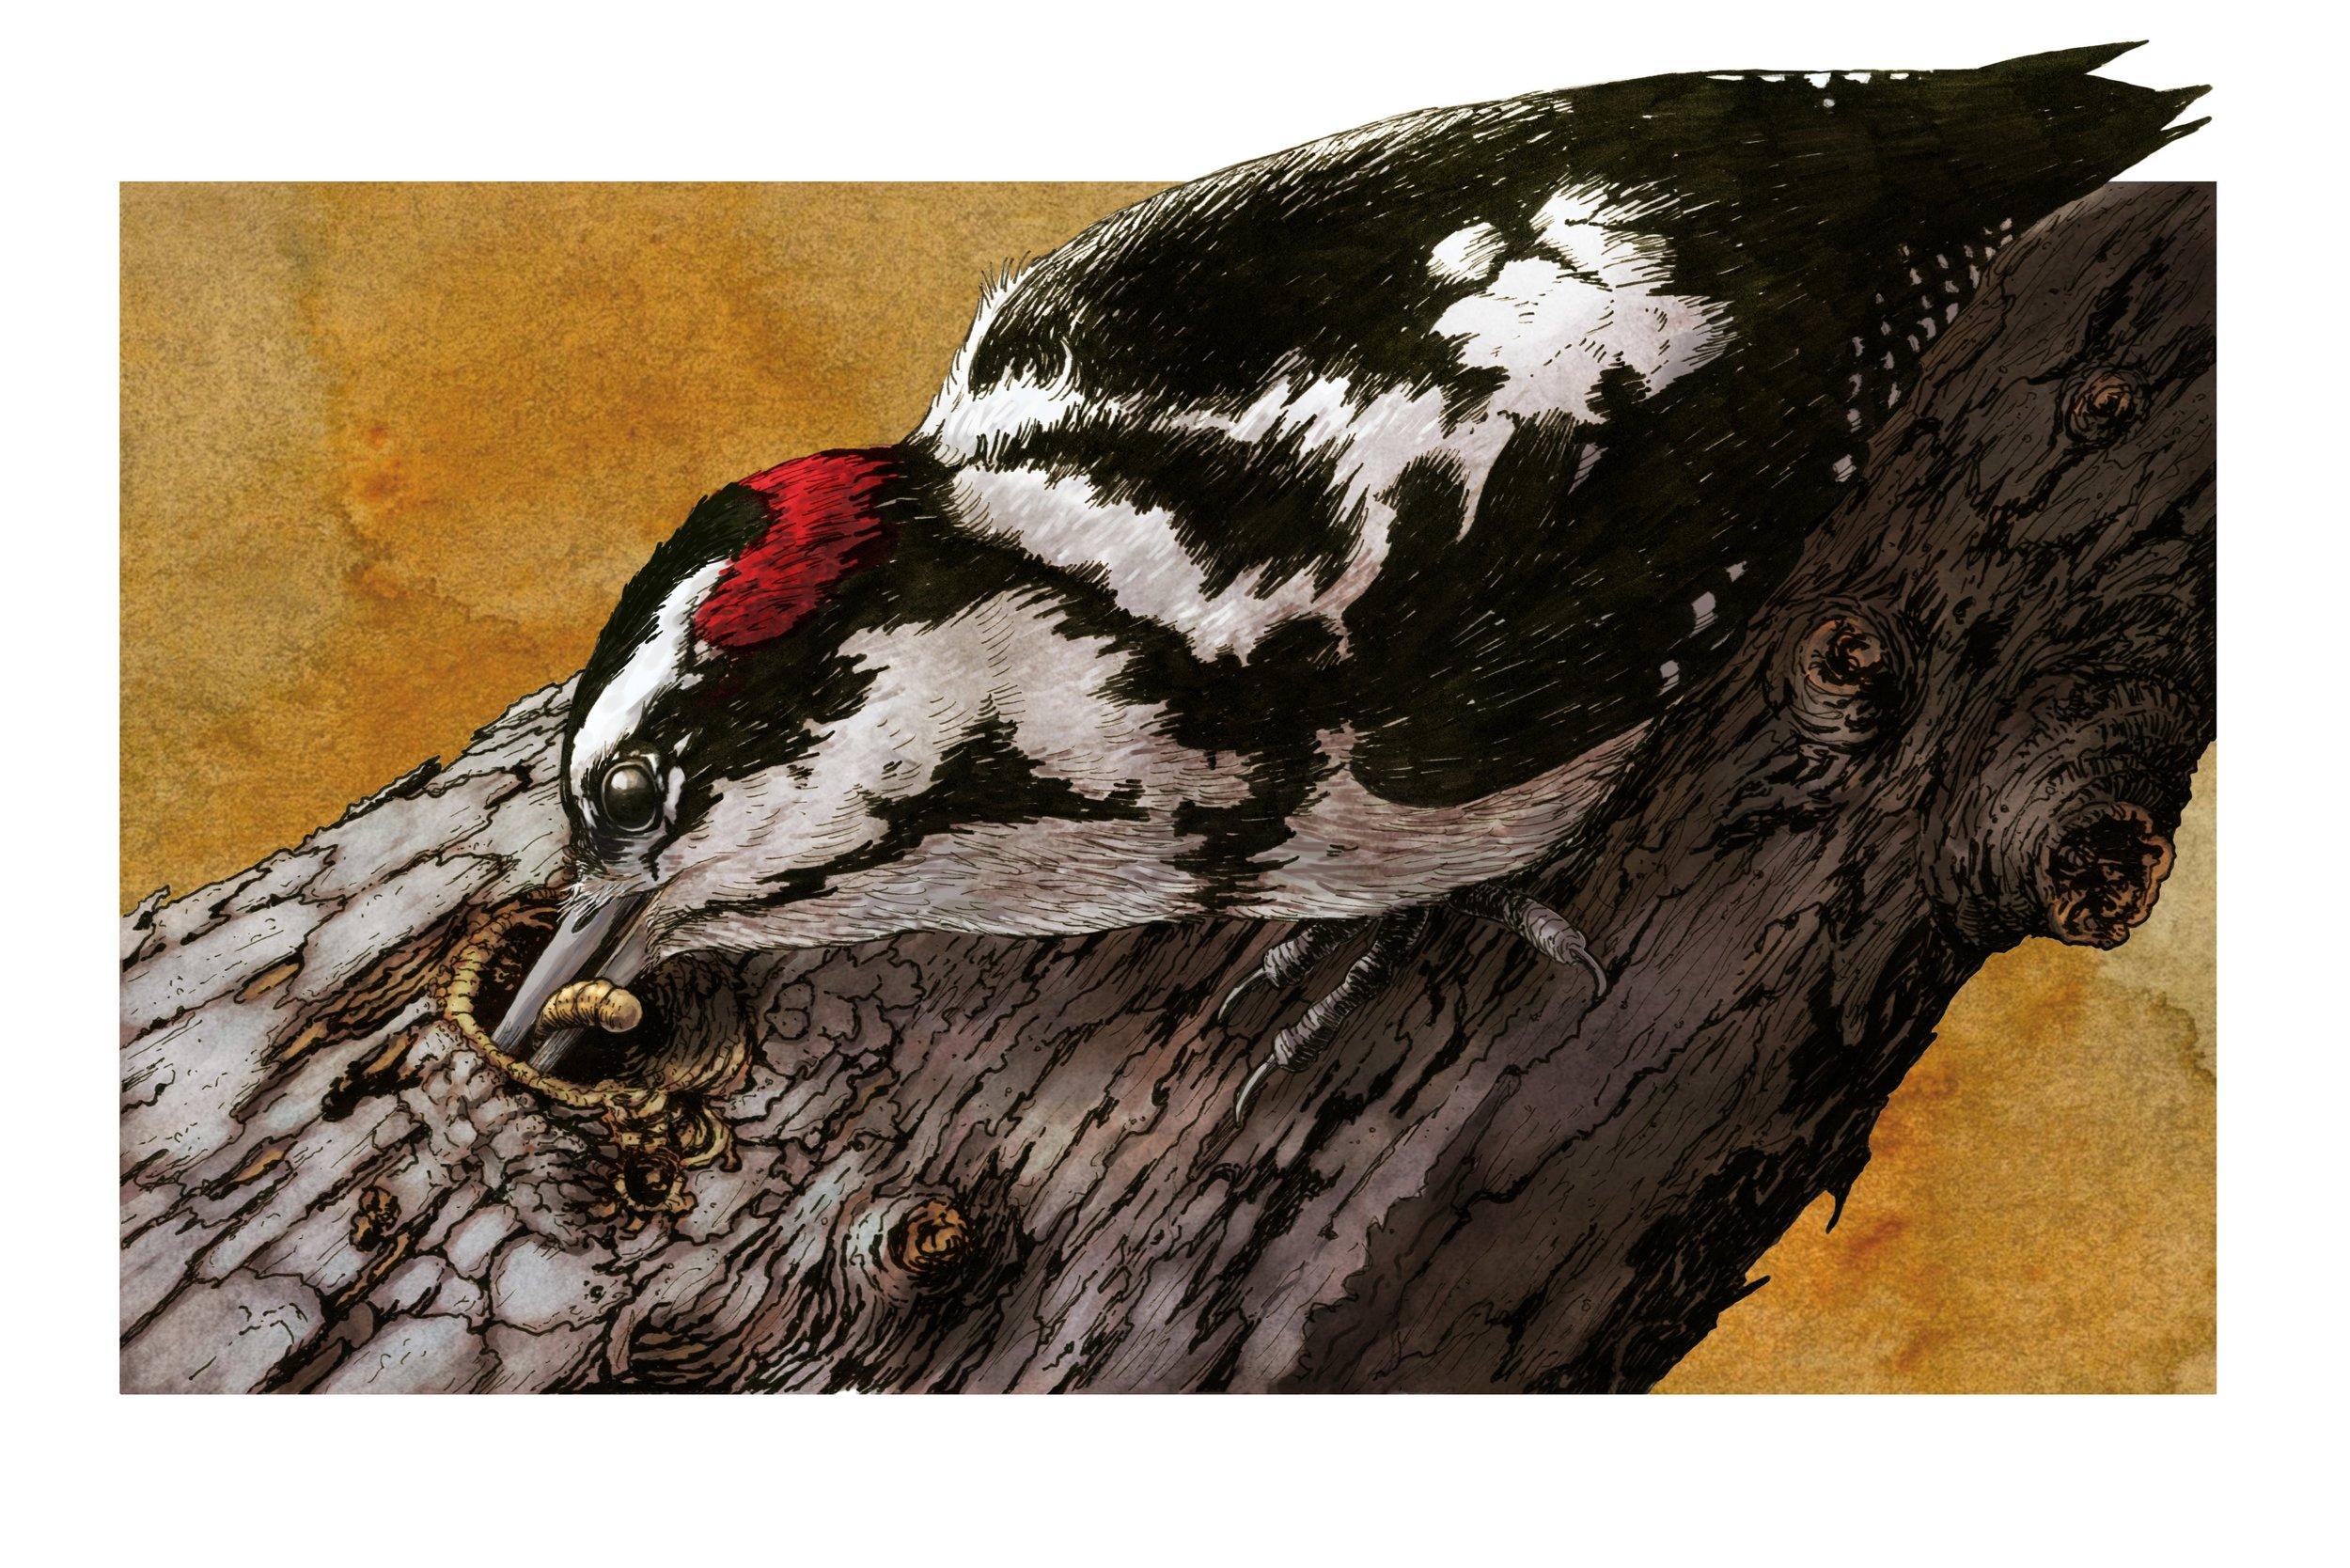 Downy Woodpecker Feeding